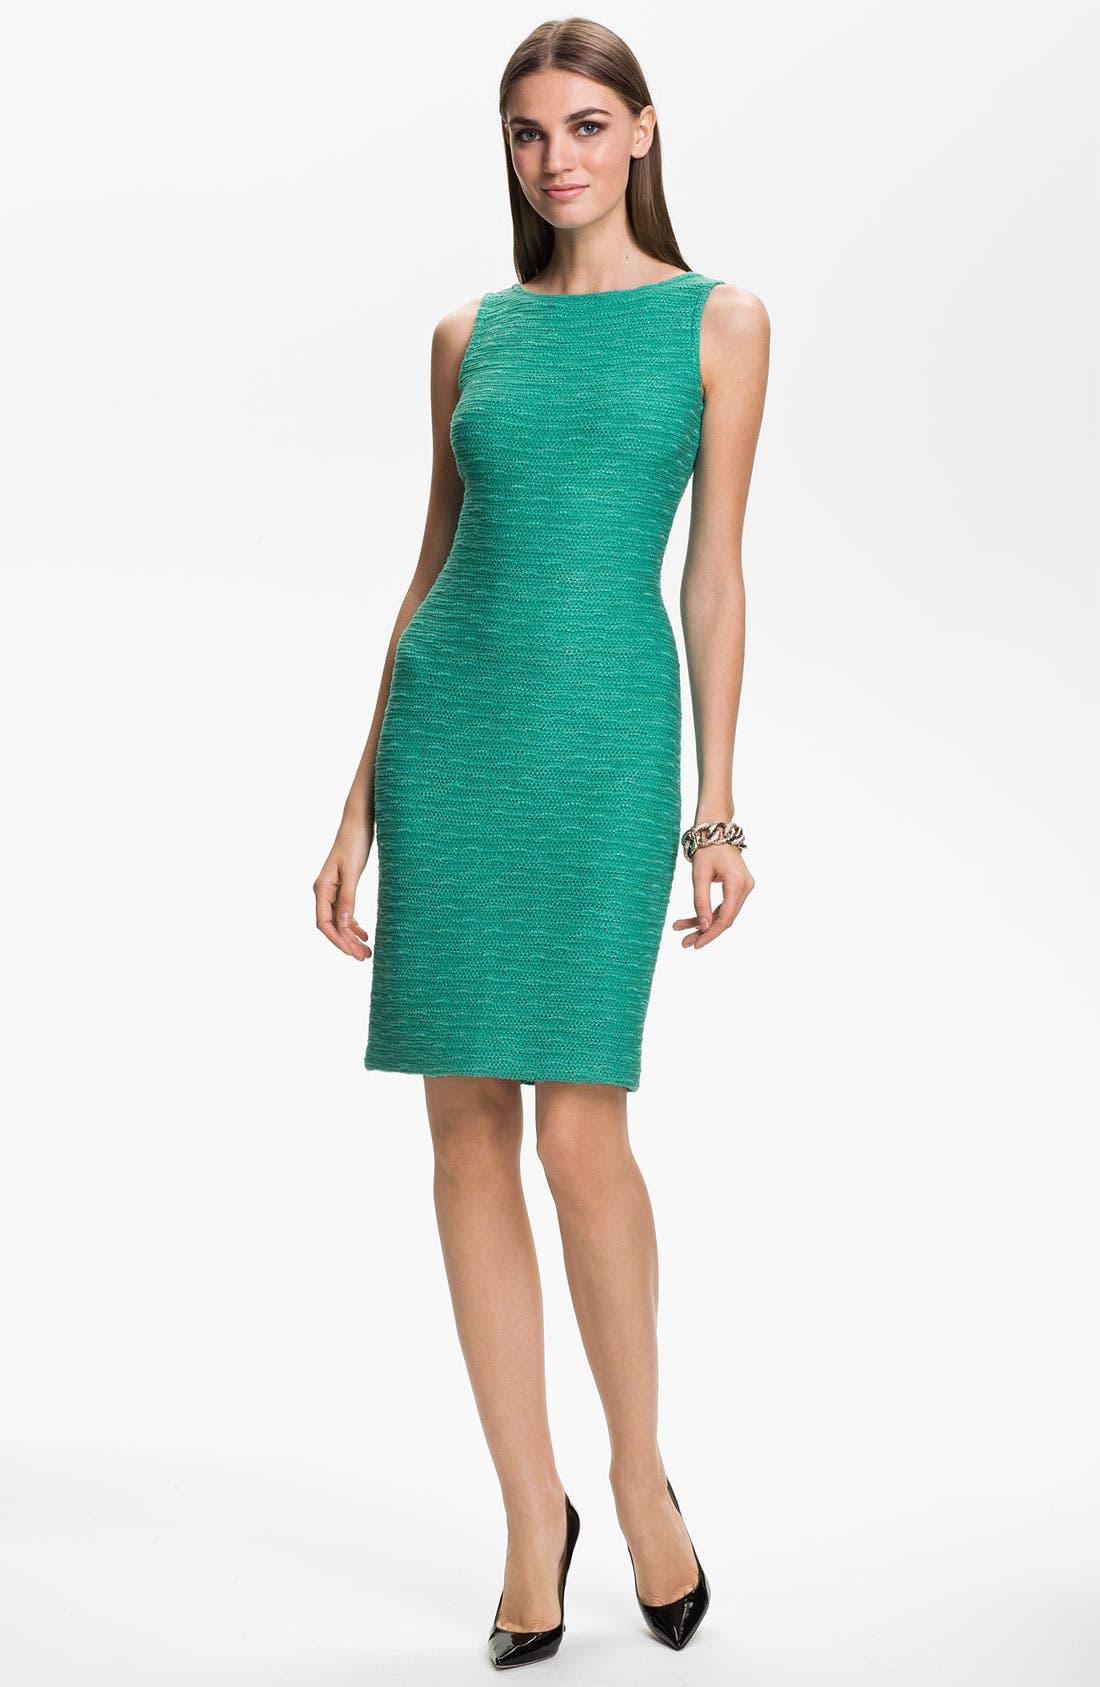 Alternate Image 1 Selected - St. John Collection 'New Shantung' Sheath Dress